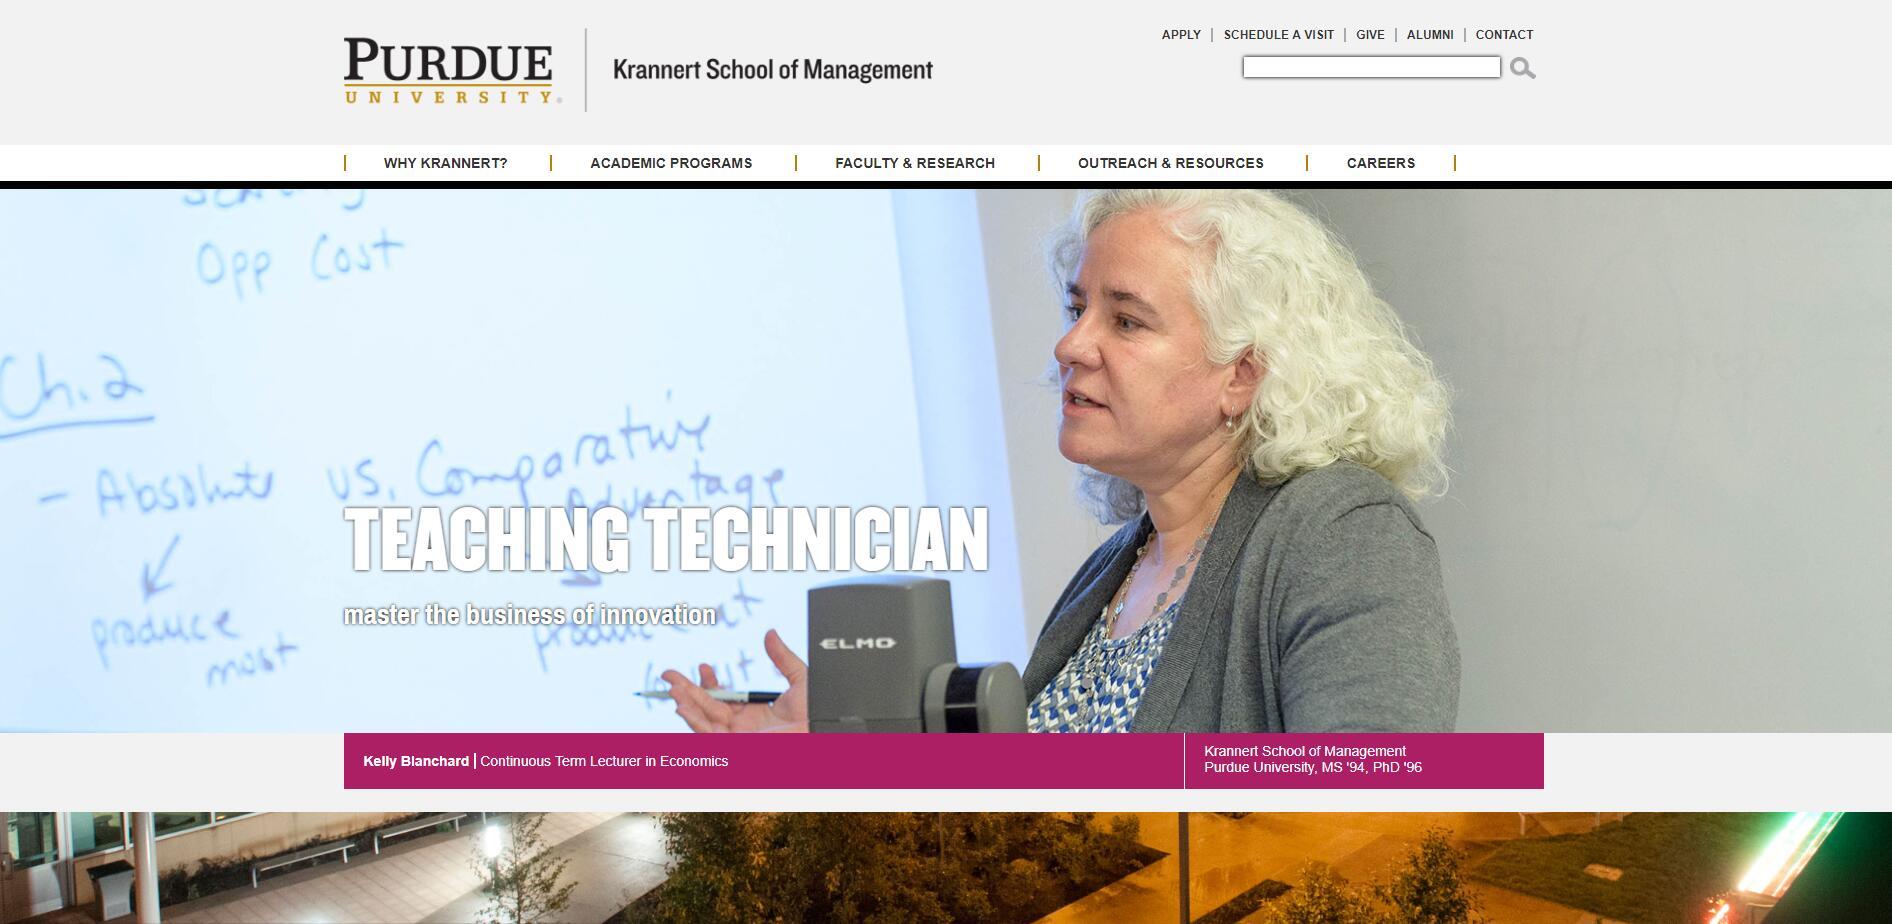 The Krannert School of Management at Purdue University–West Lafayette